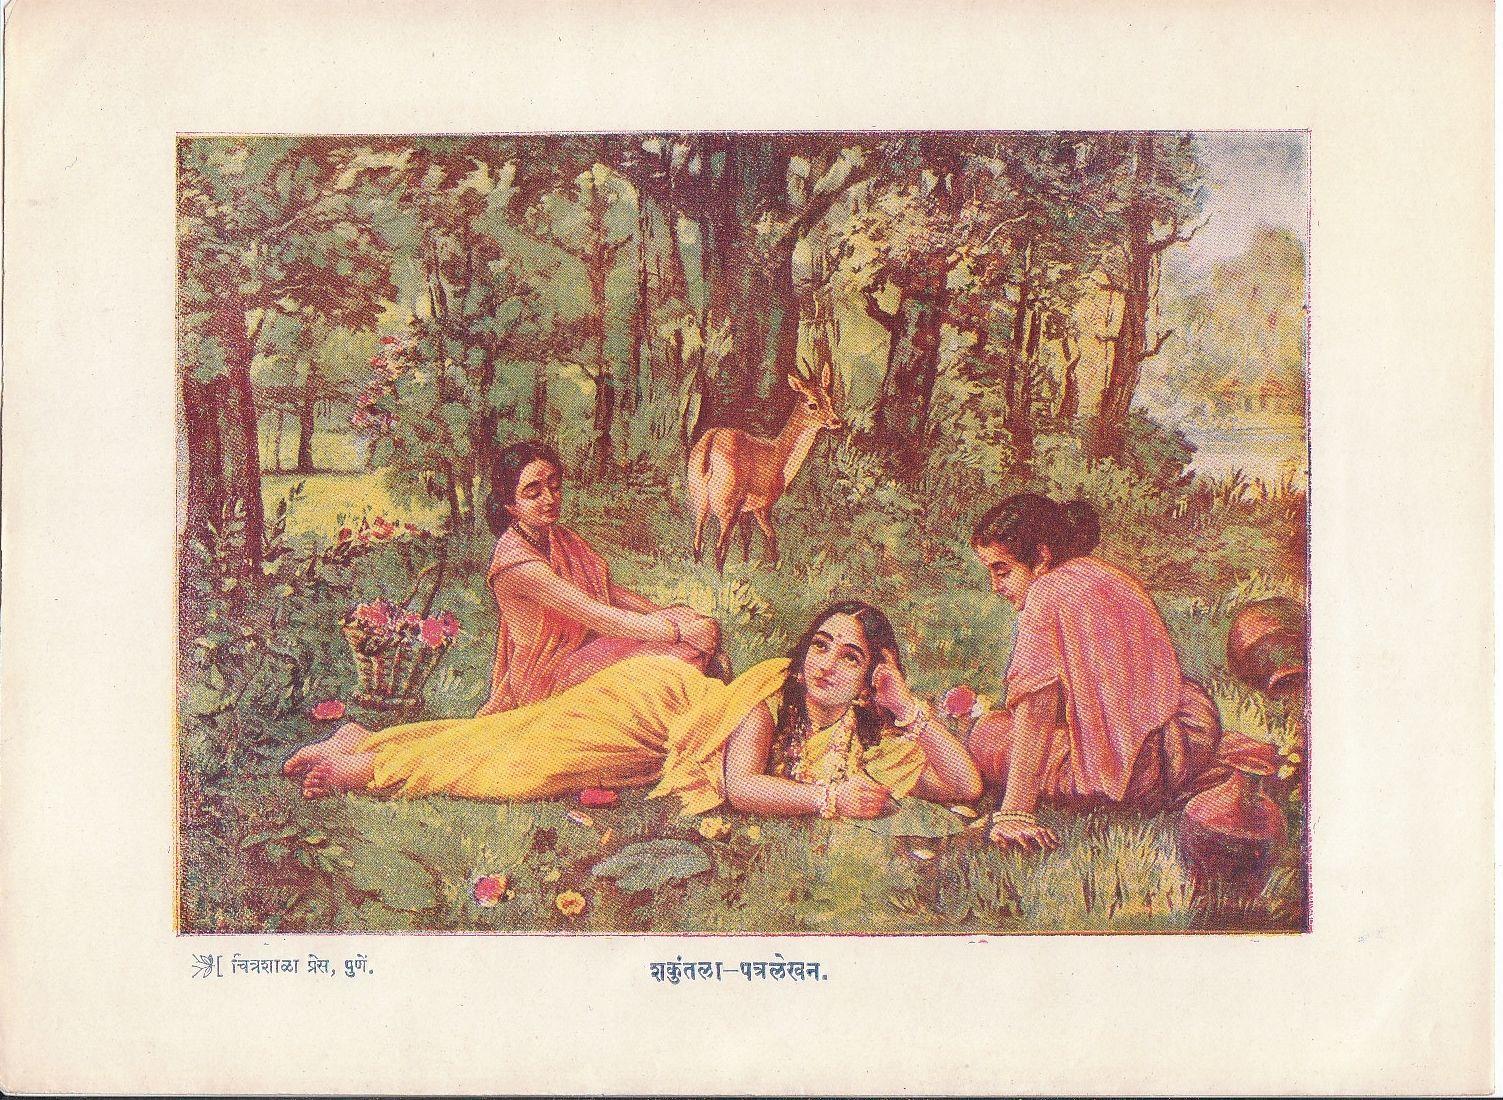 Shakuntala Writing a Letter - Indian Lithograph,  Chitrashala Press, Pune c1920-30